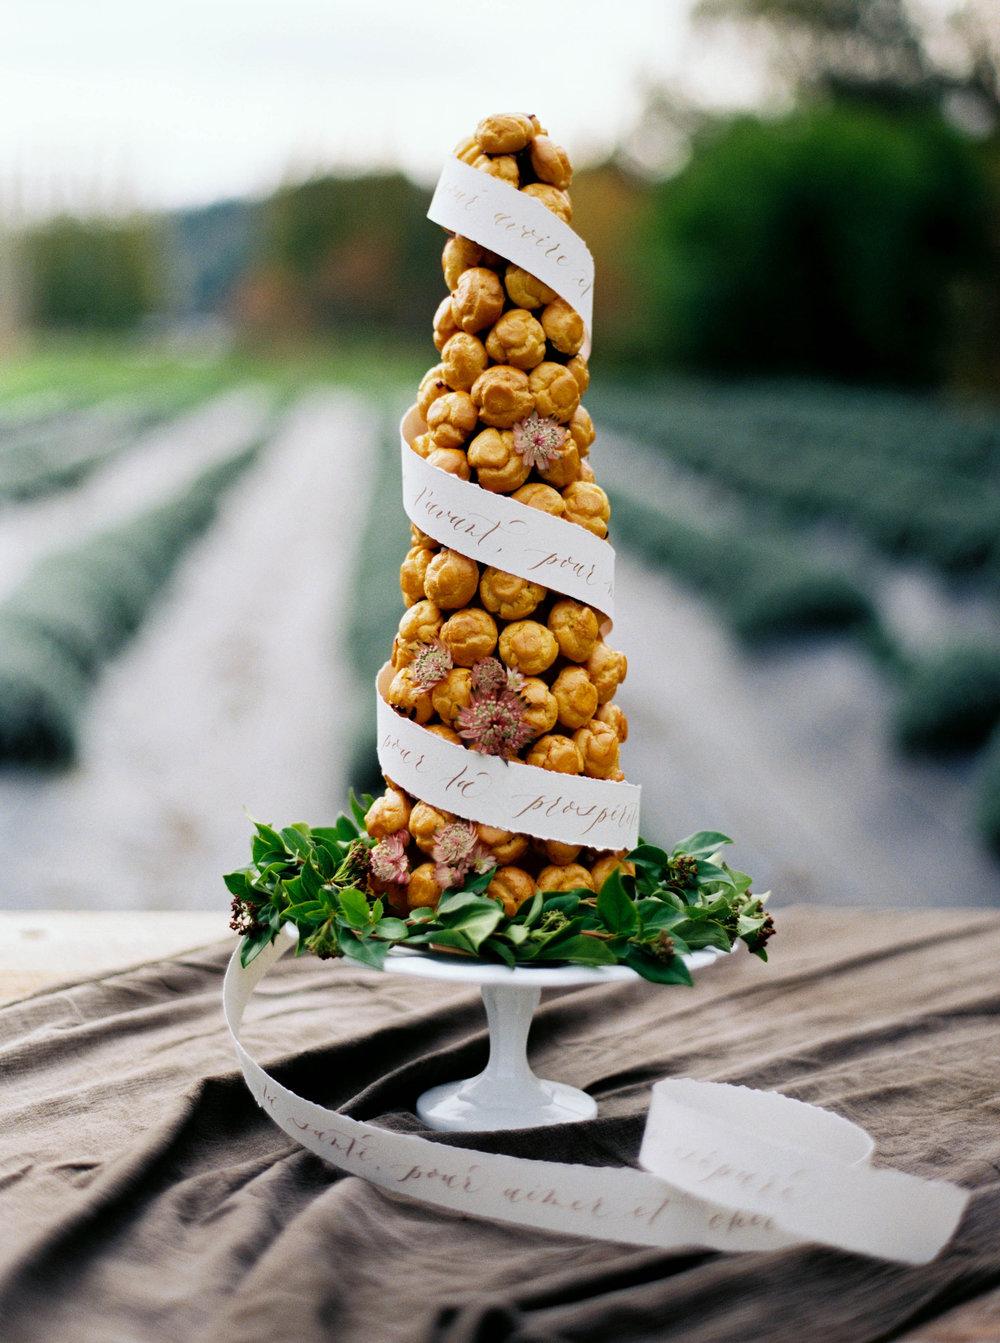 croquembouche wedding cake with flowers.JPG